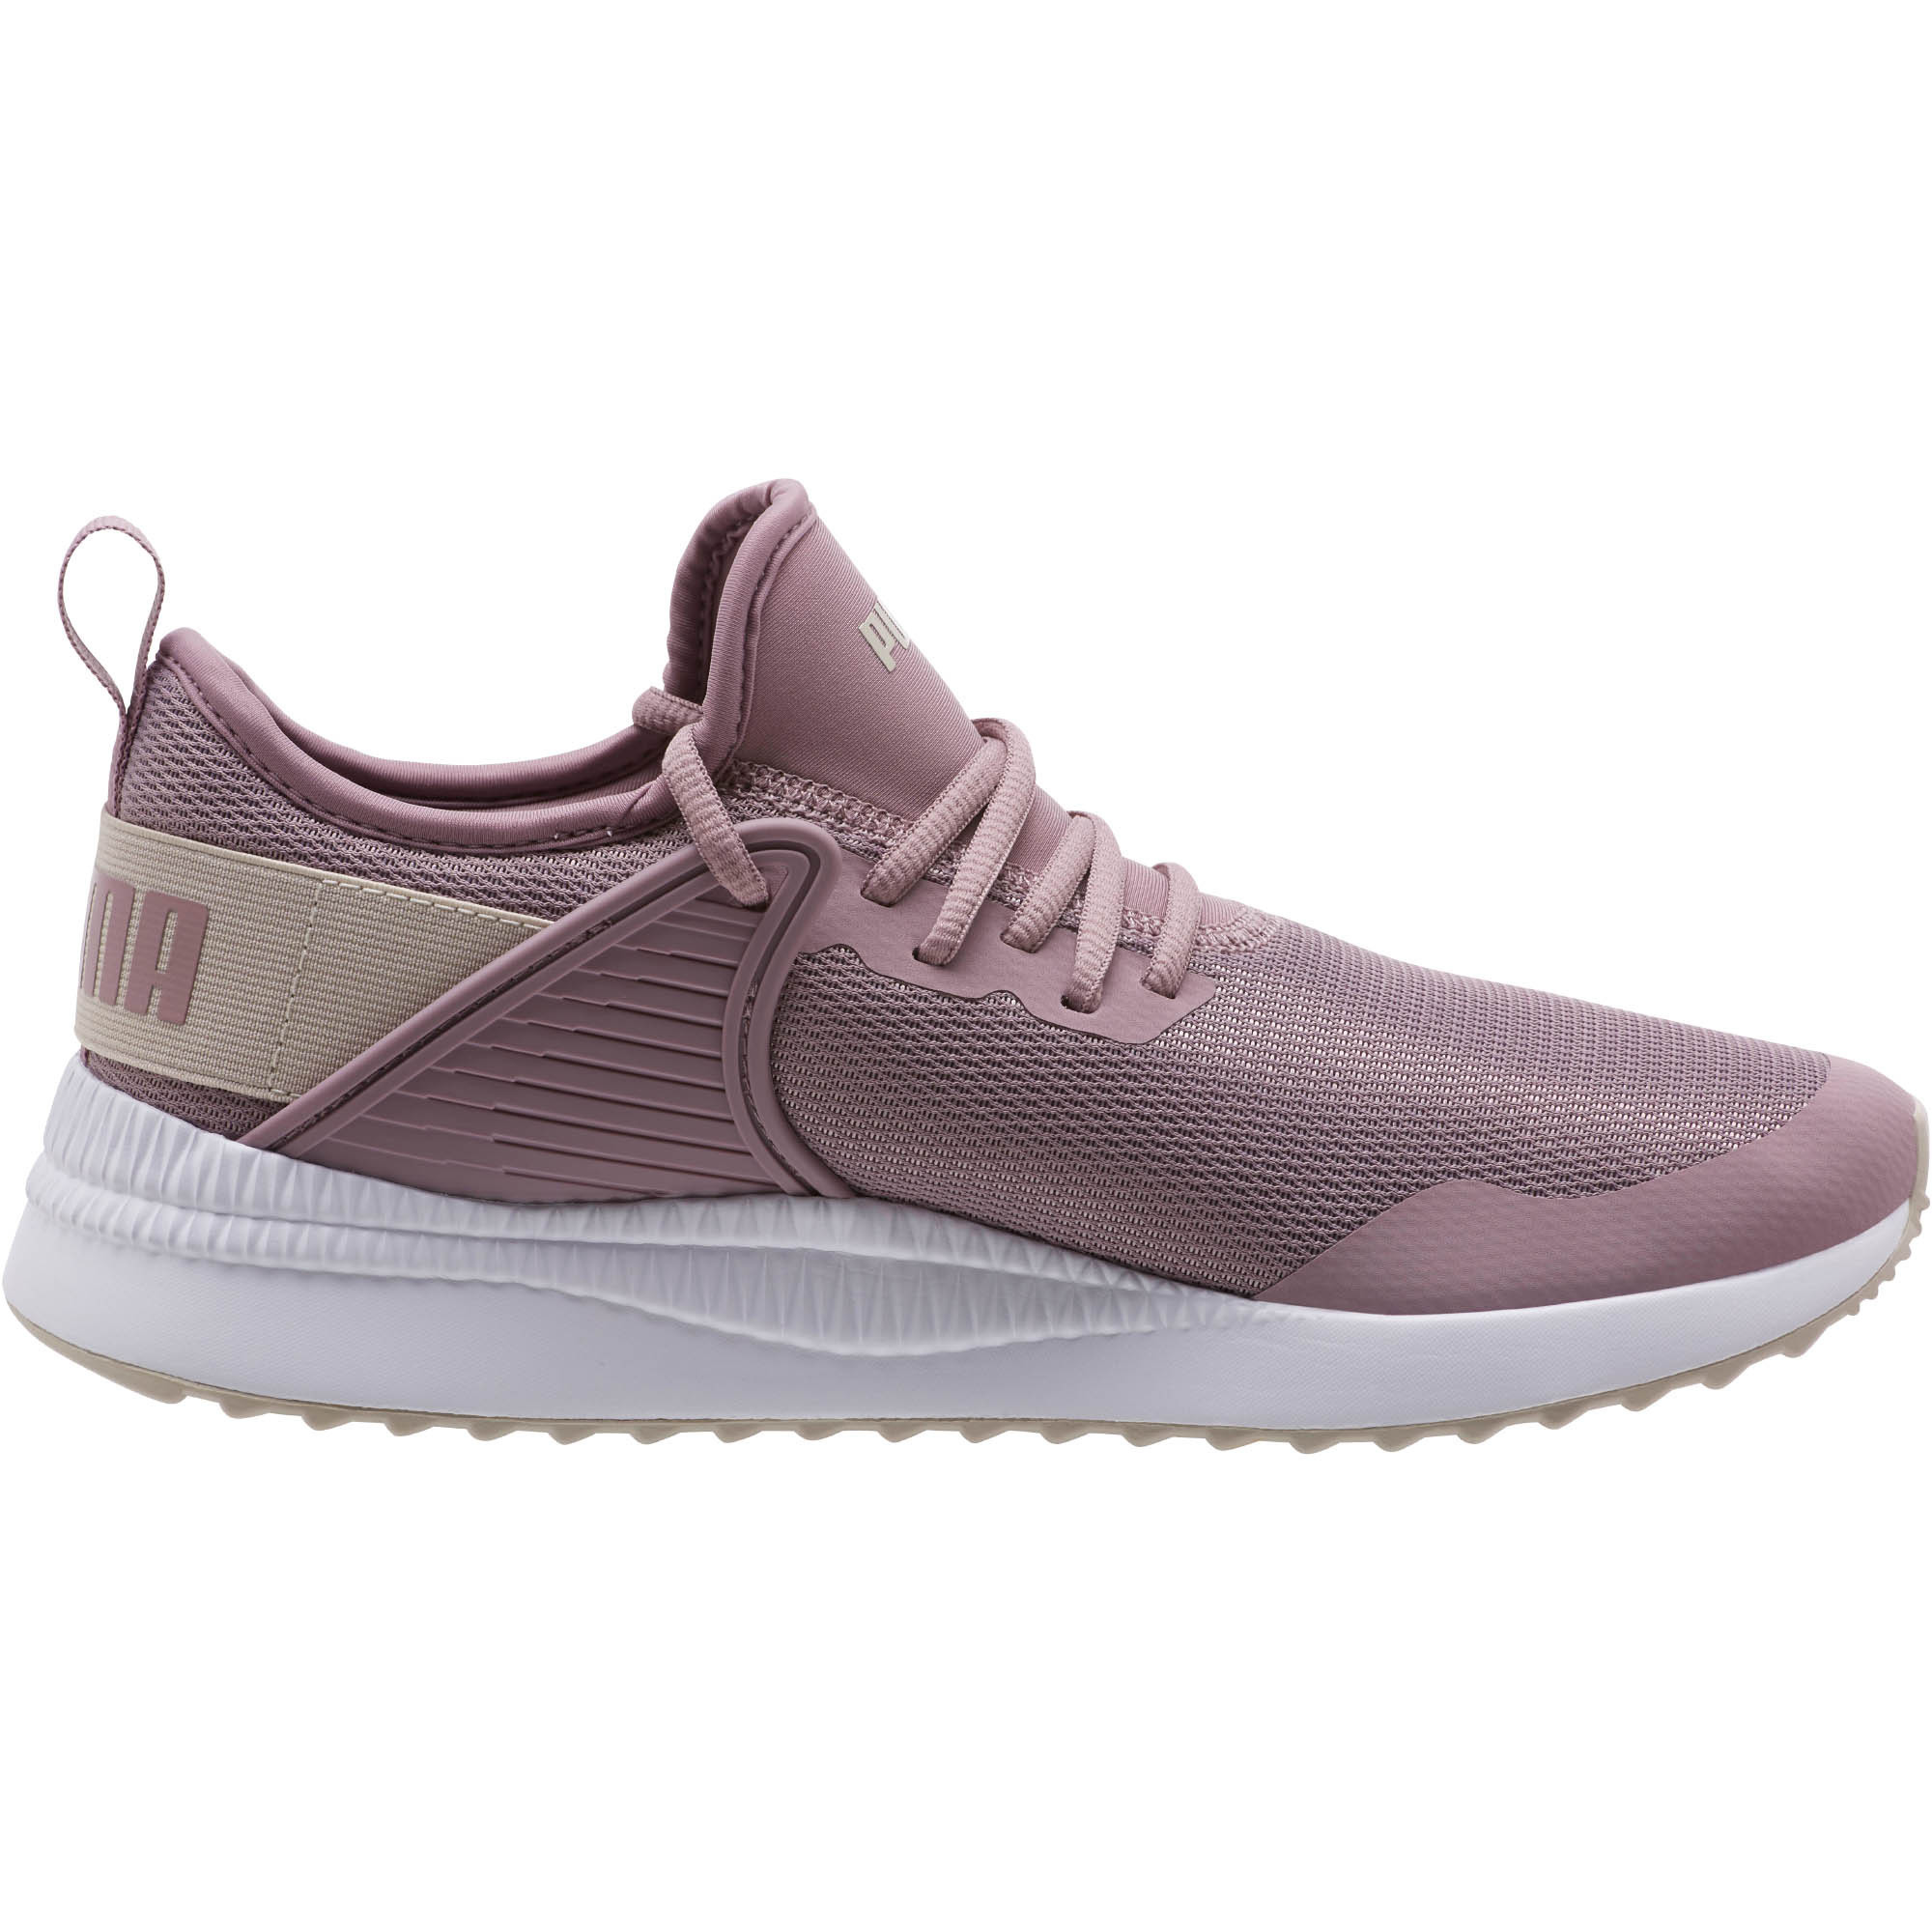 PUMA-Pacer-Next-Cage-Sneakers-Men-Shoe-Basics thumbnail 20